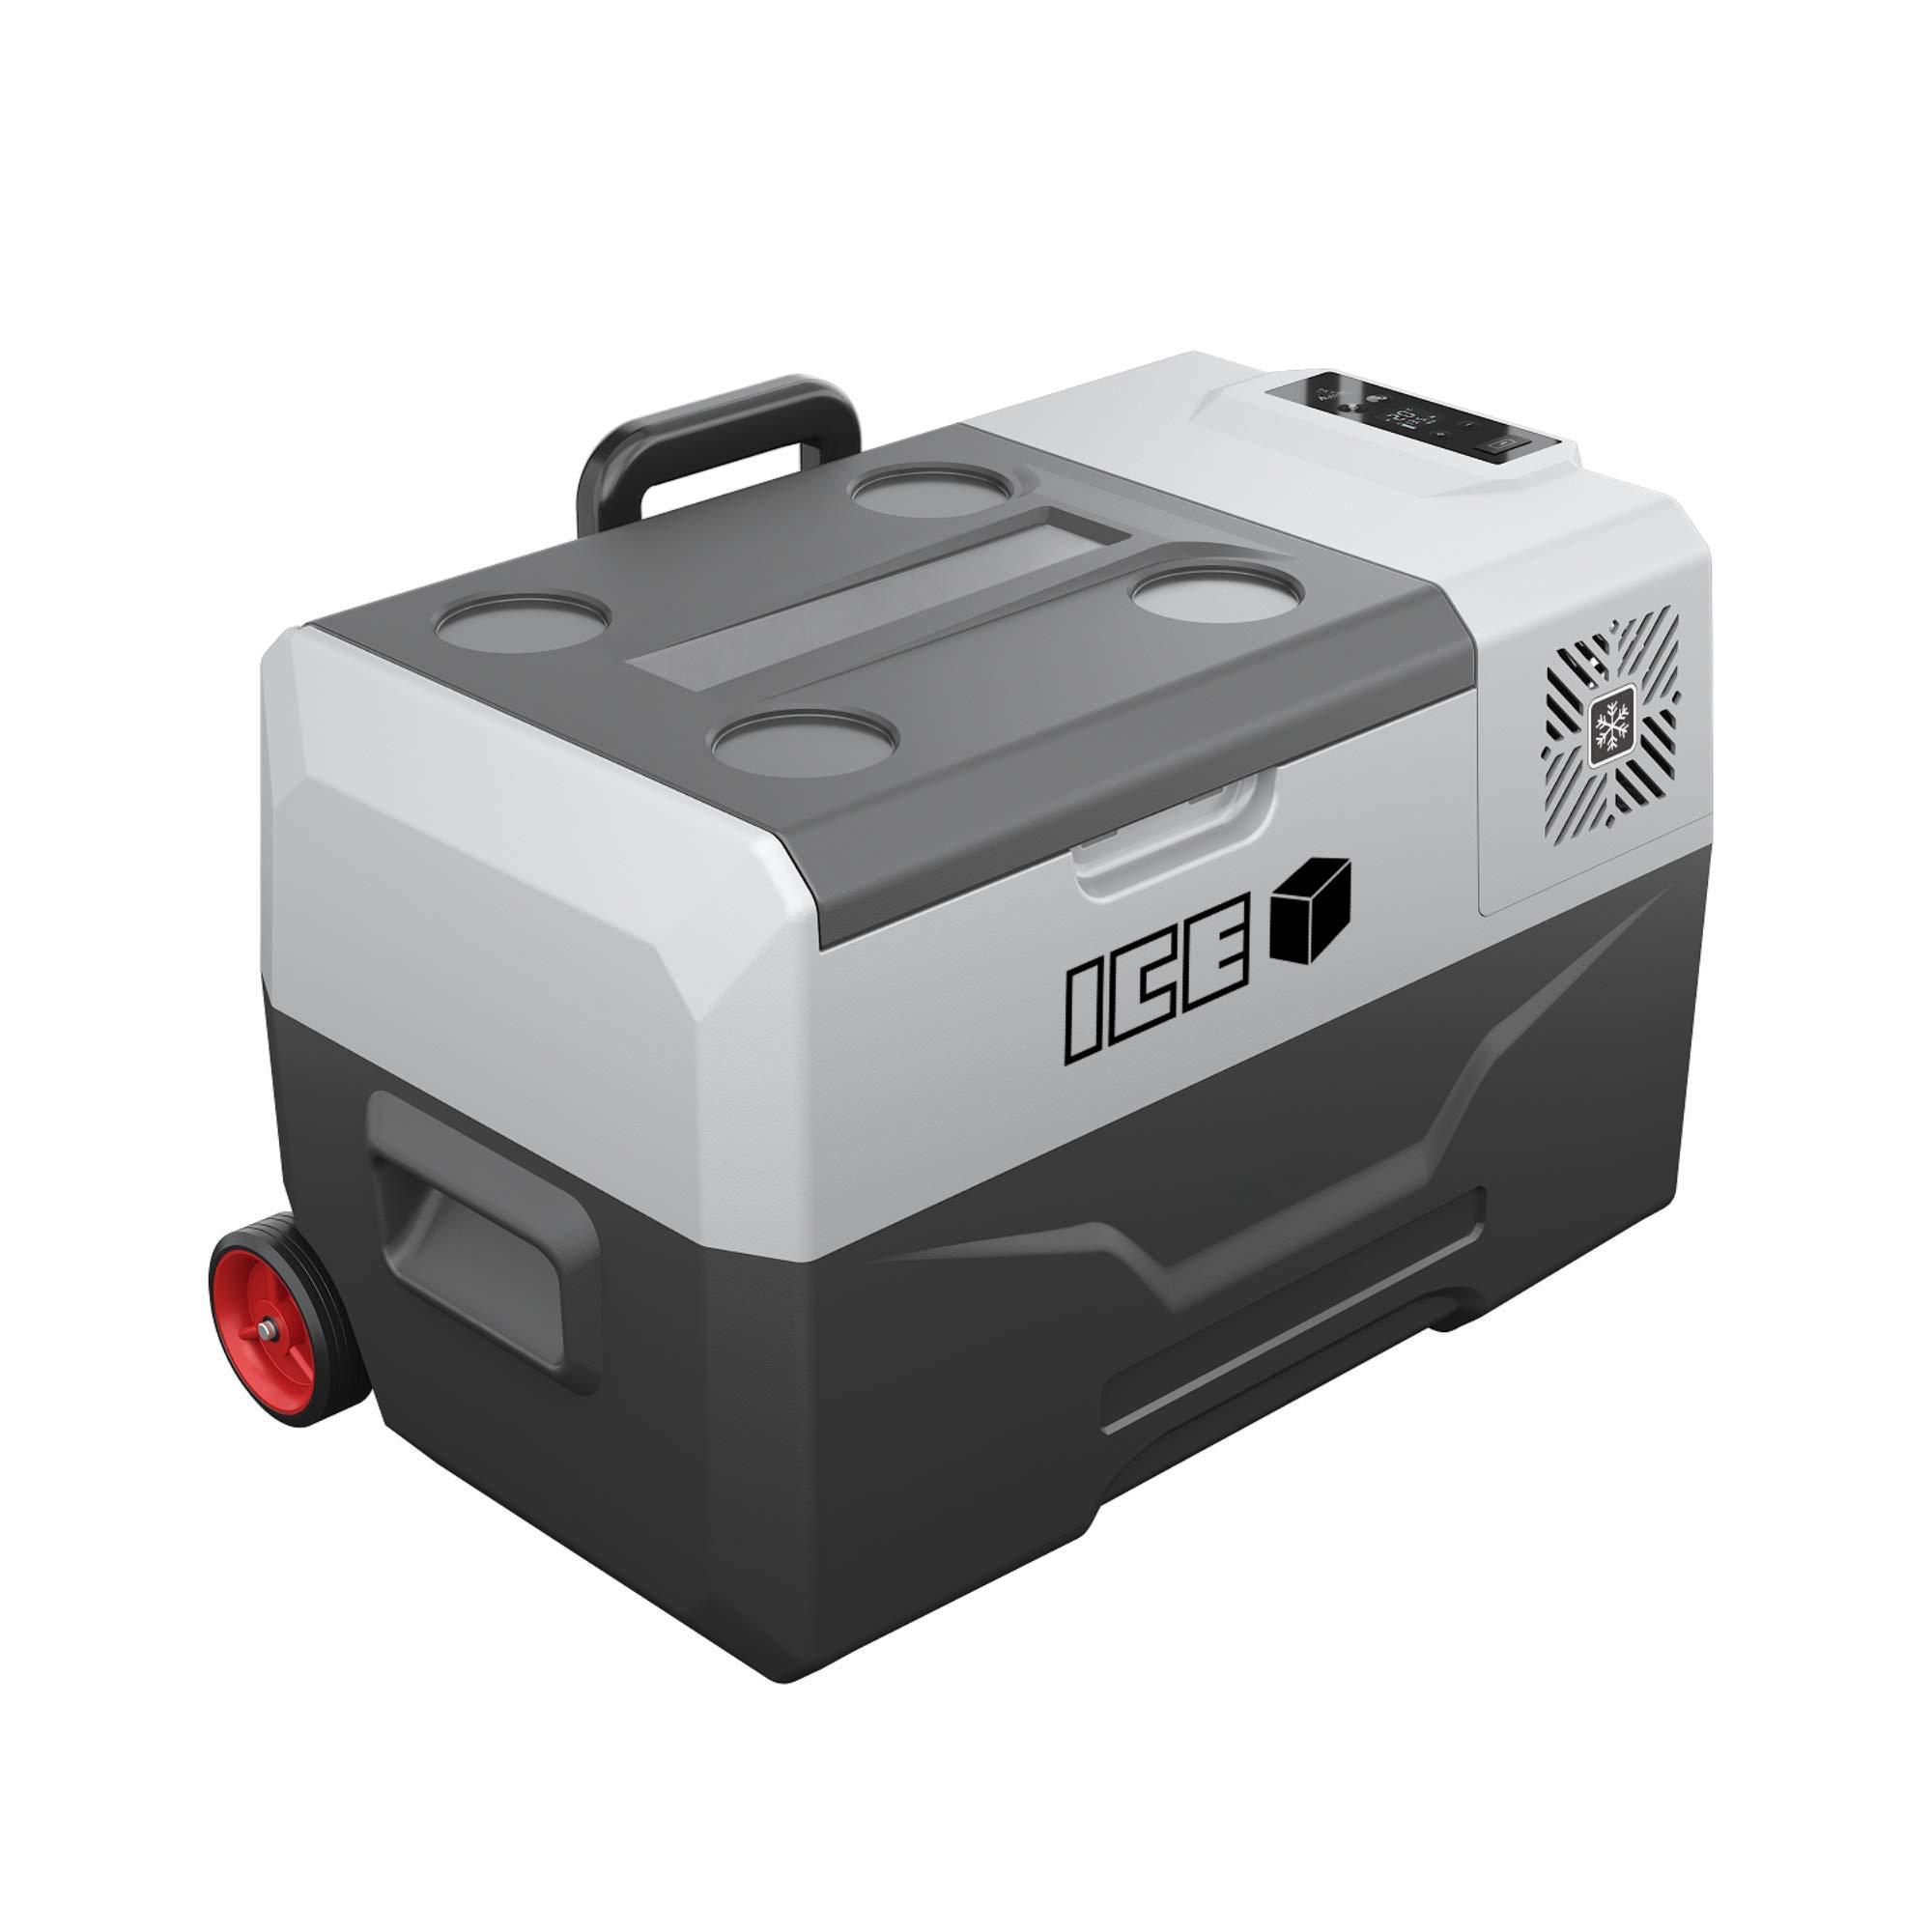 Icecube Mini Series Portable Electric AC/DC Mini Compact Compressor Refrigerators (31 qt)